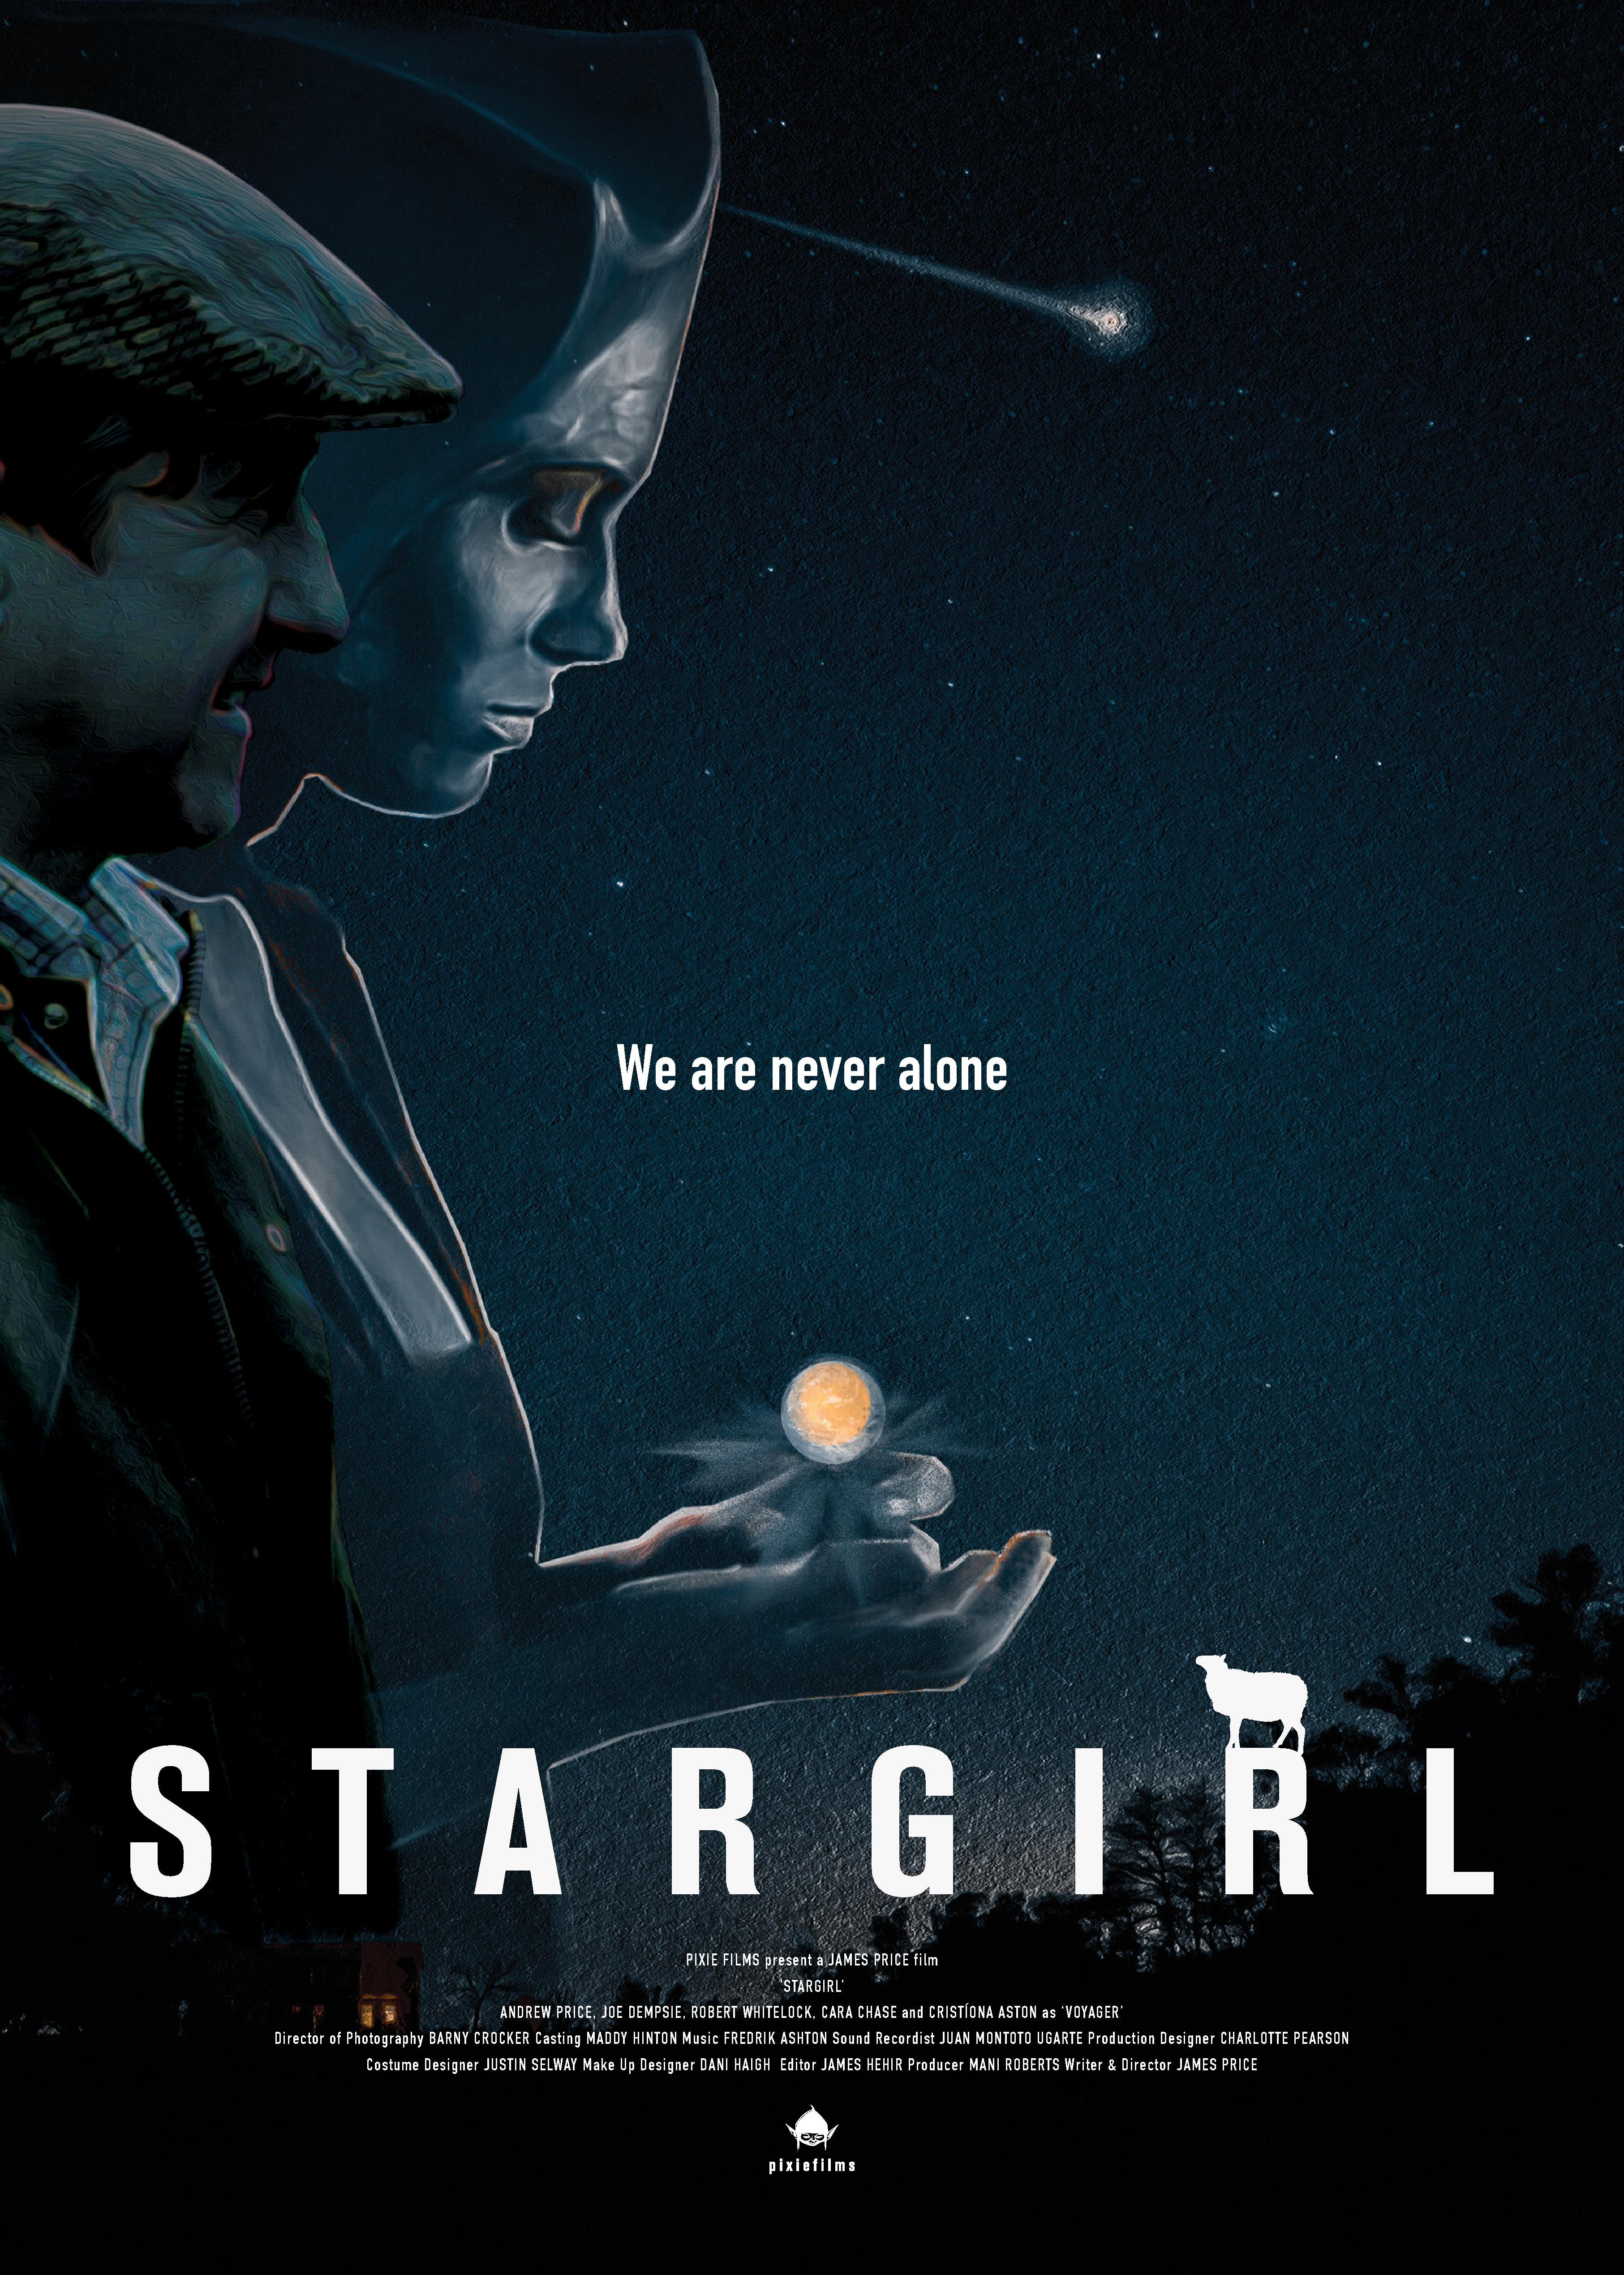 genre of stargirl